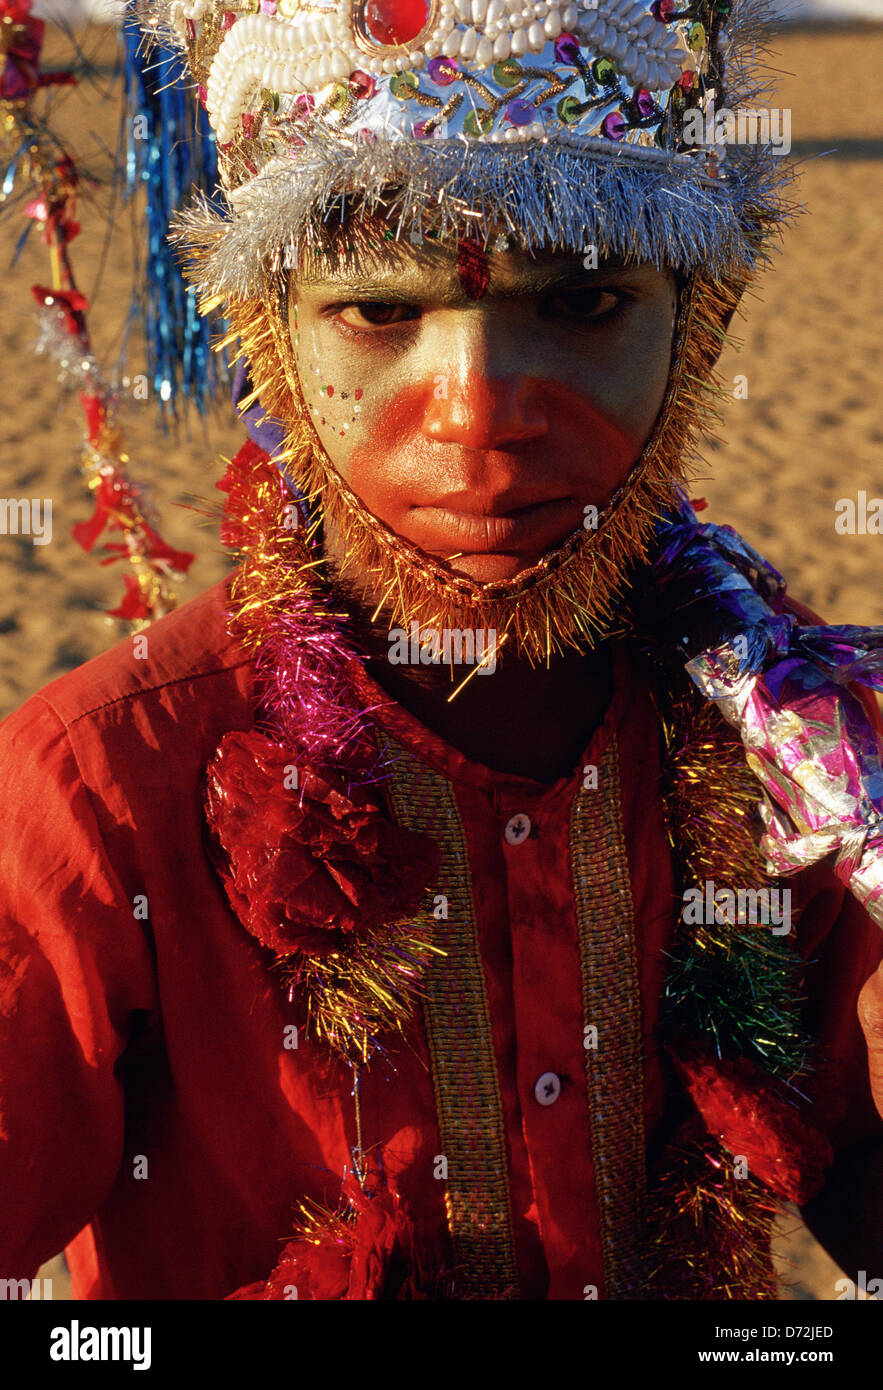 A hindu boy is made up and dressed like Hanuman, the monkey god ( India) - Stock Image